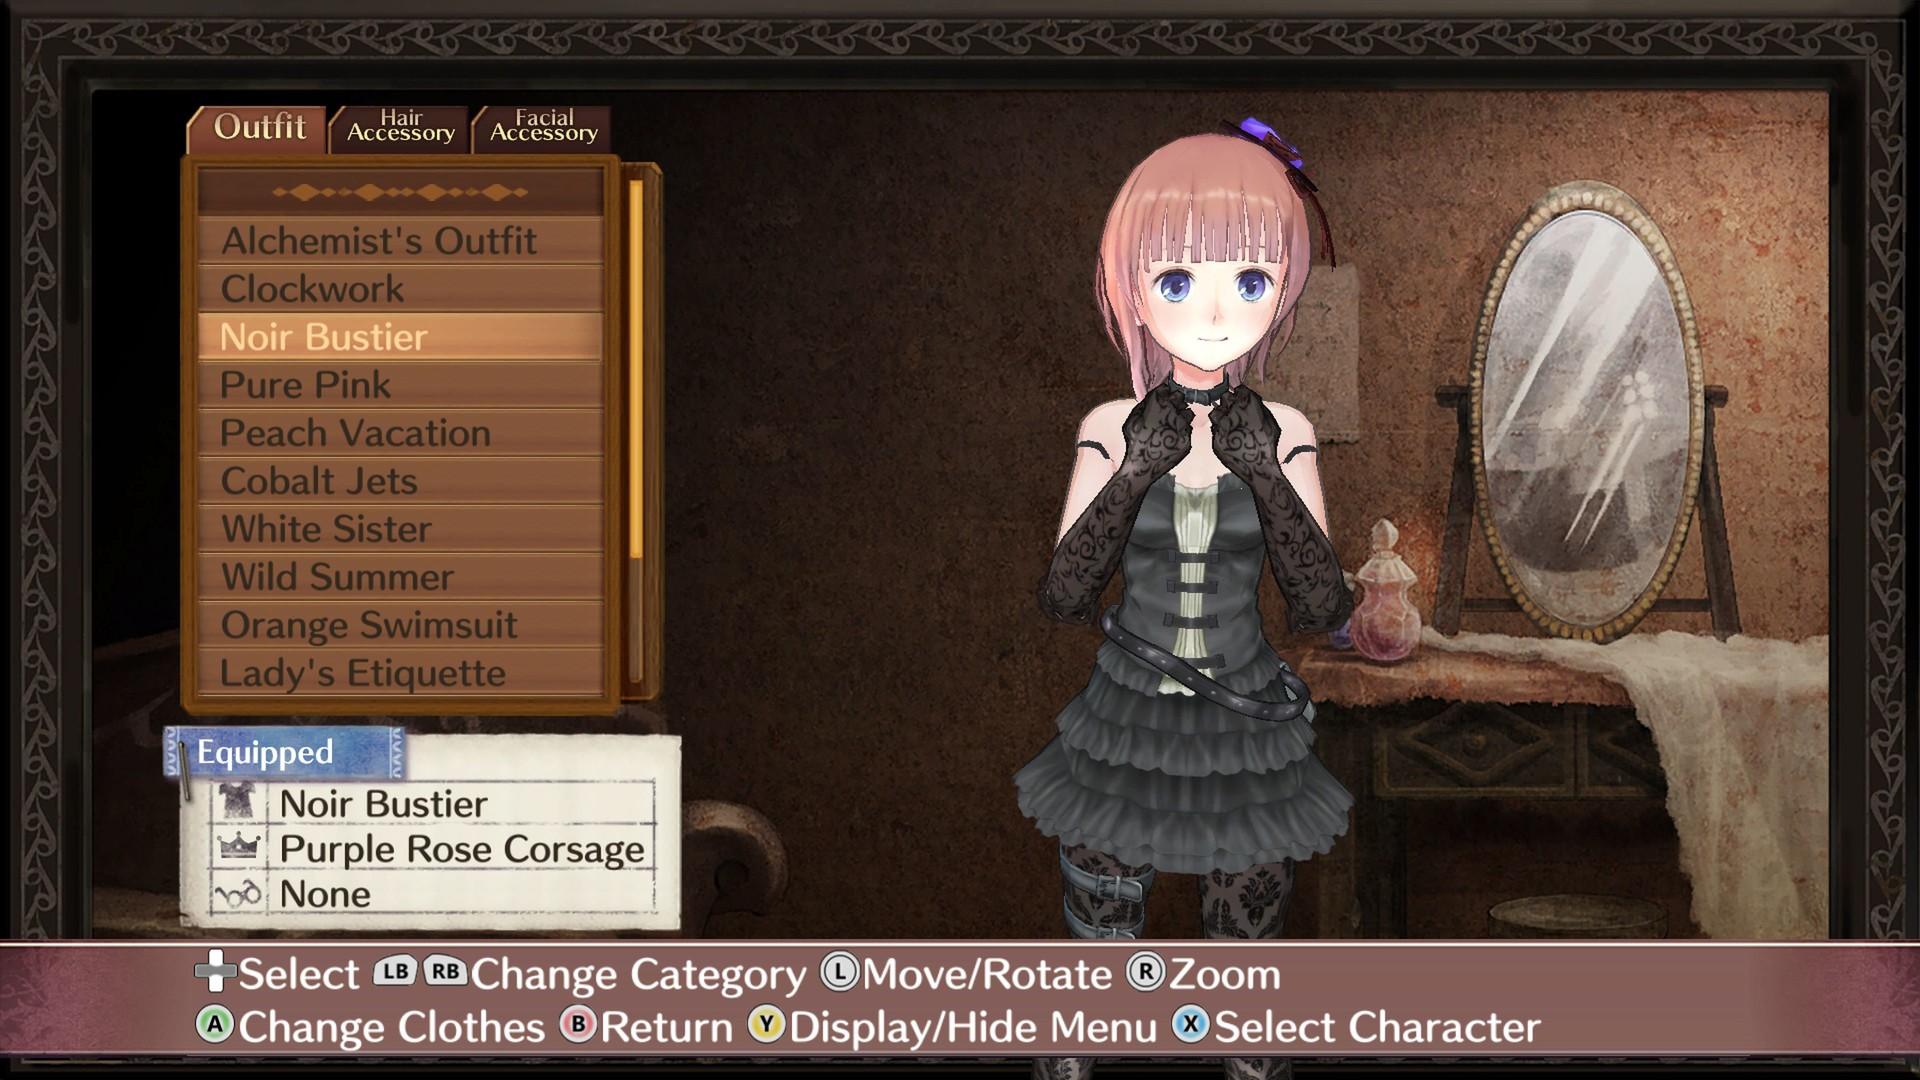 Atelier Rorona ~The Alchemist of Arland~ DX - ロロナのアトリエ ~アーランドの錬金術士~ DX PC Key Fiyatları